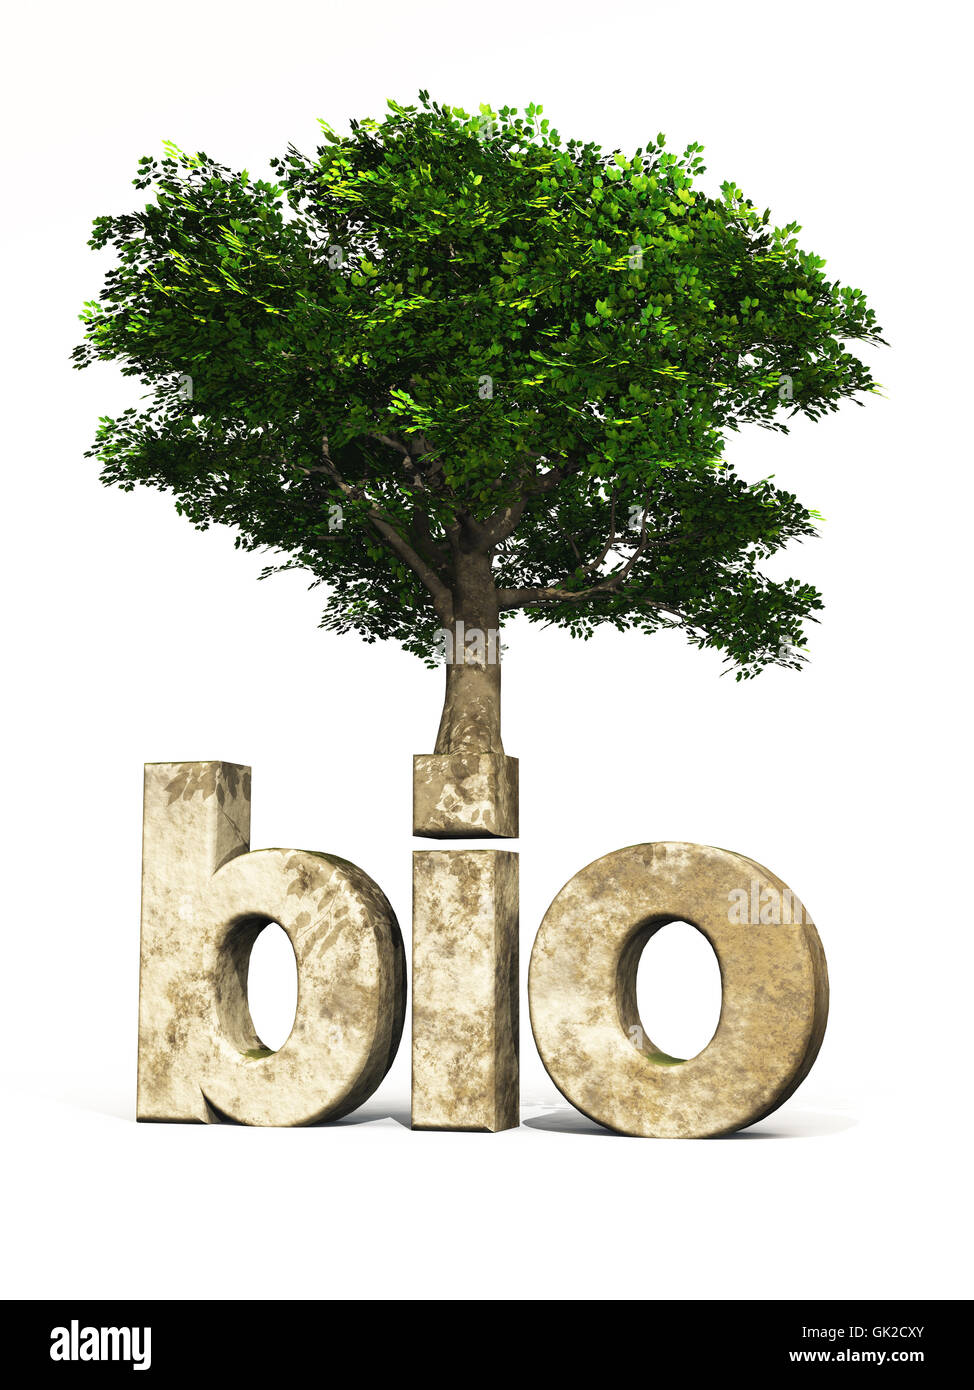 eco model design - Stock Image